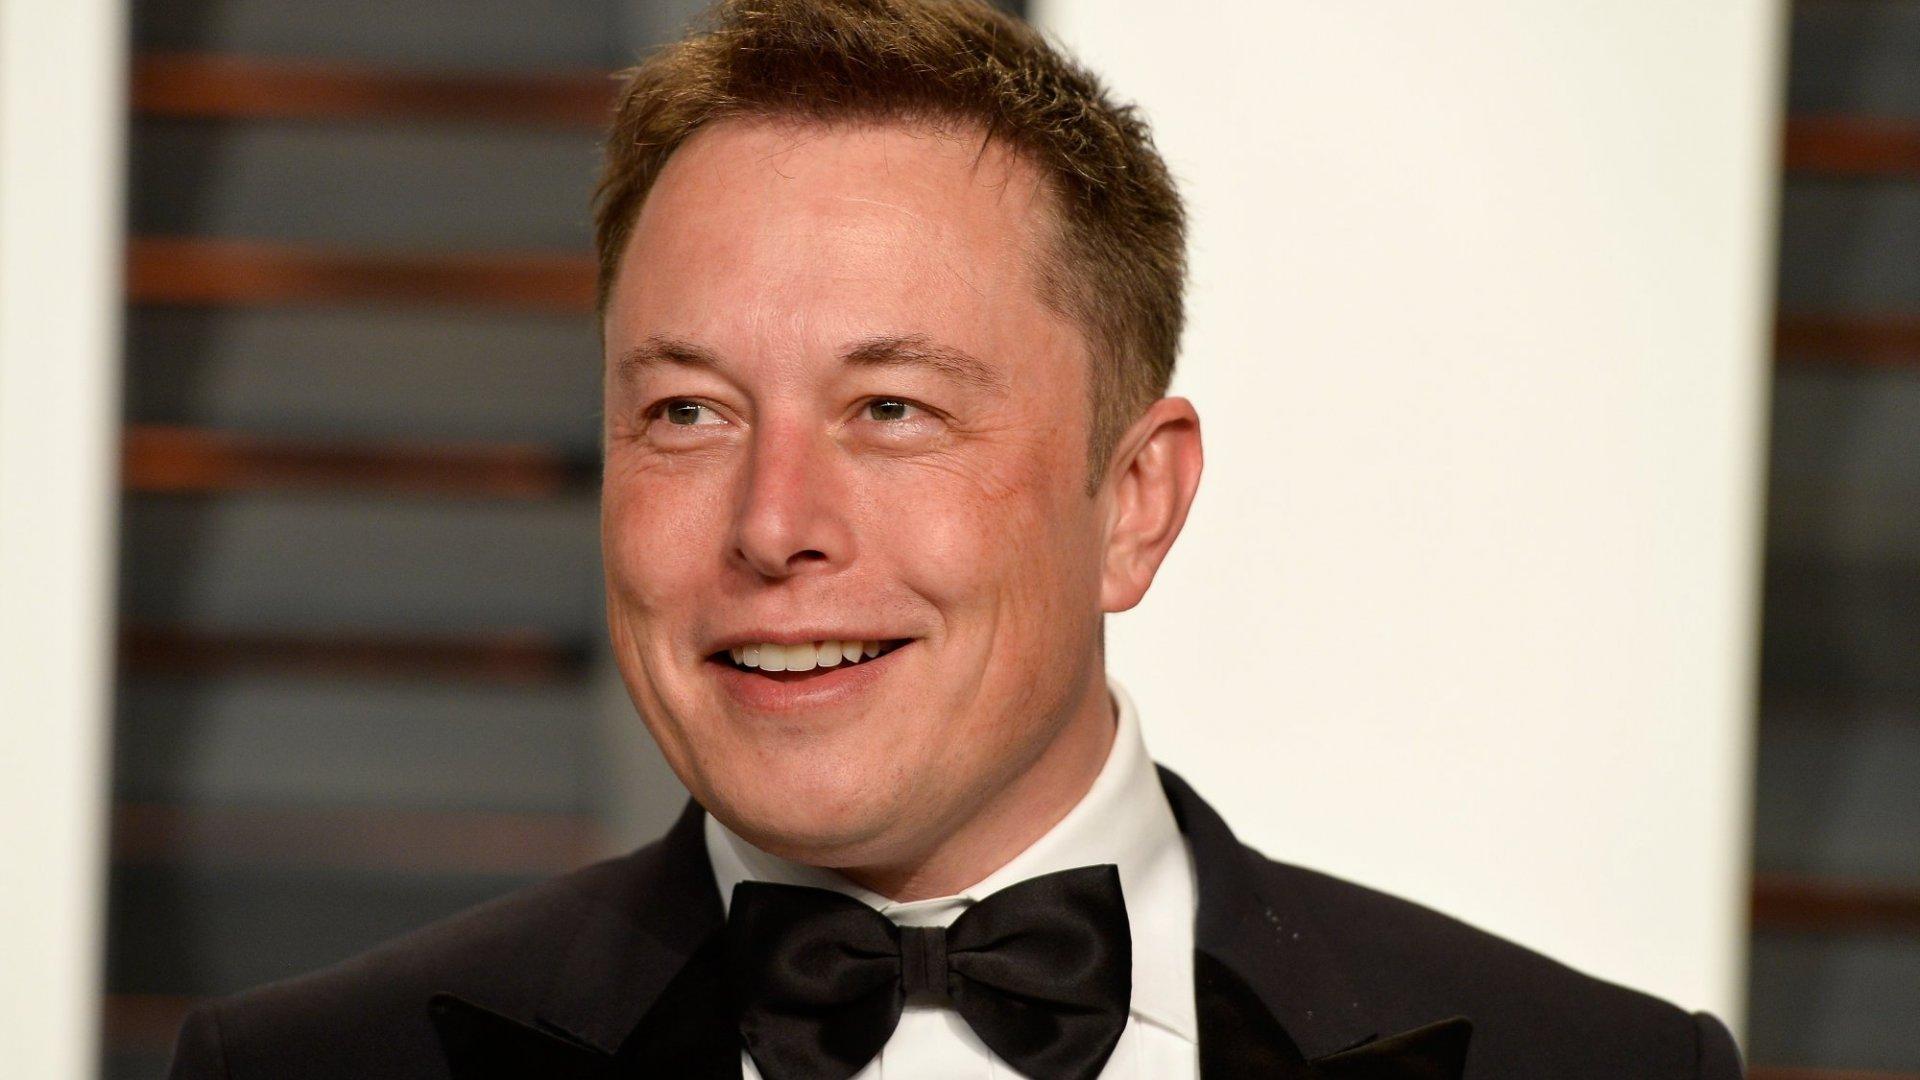 Elon Musk Fires Back at Harvard Psychologist Steven Pinker Over the Future of Artificial Intelligence